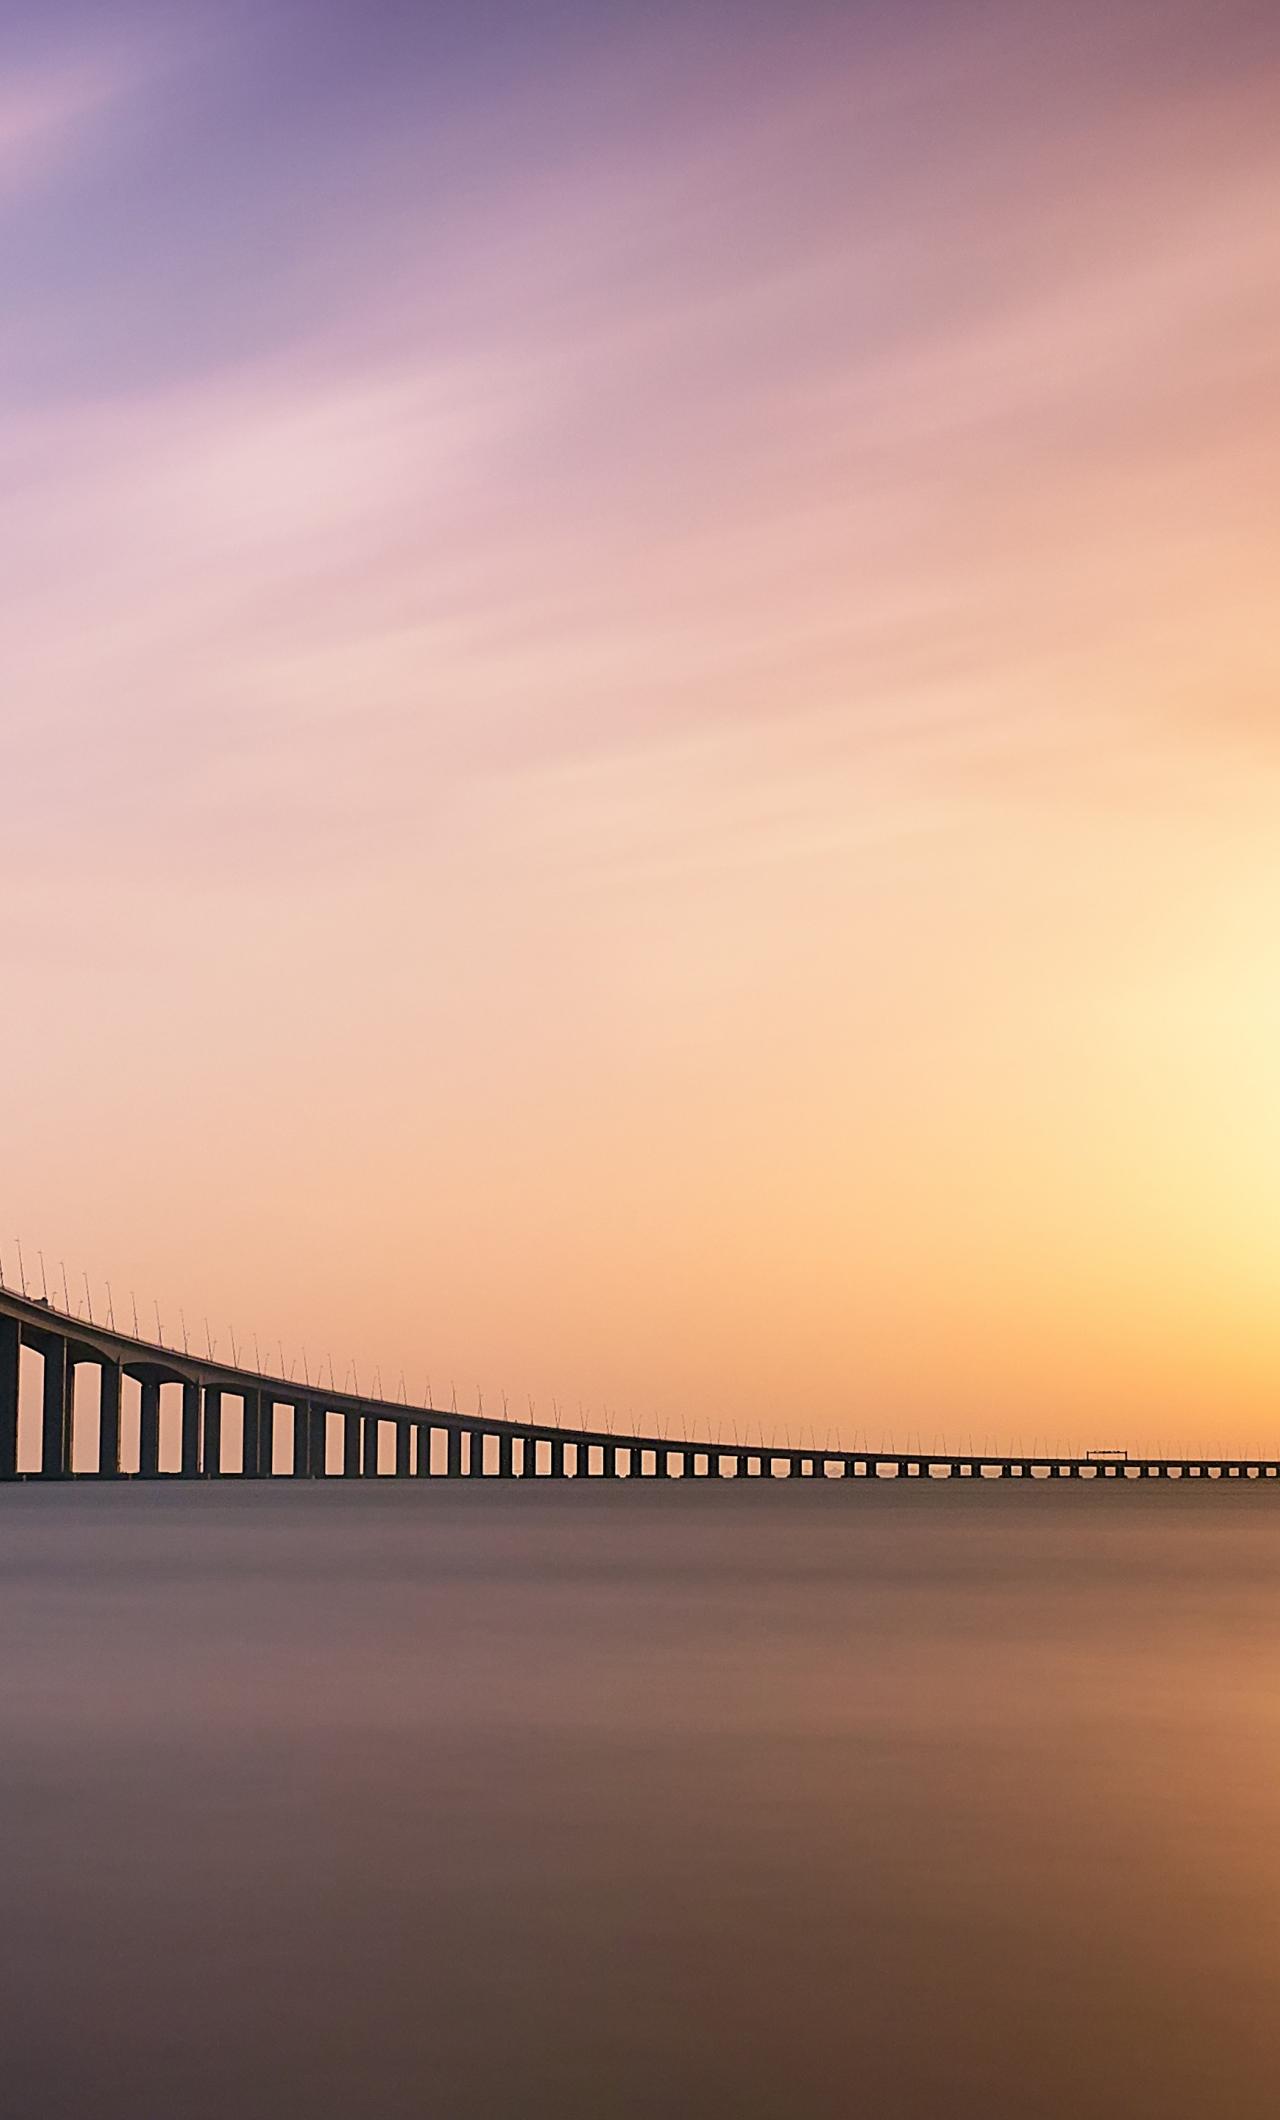 Download 1280x2120 Wallpaper Sunset Minimal Vasco Da Gama Bridge